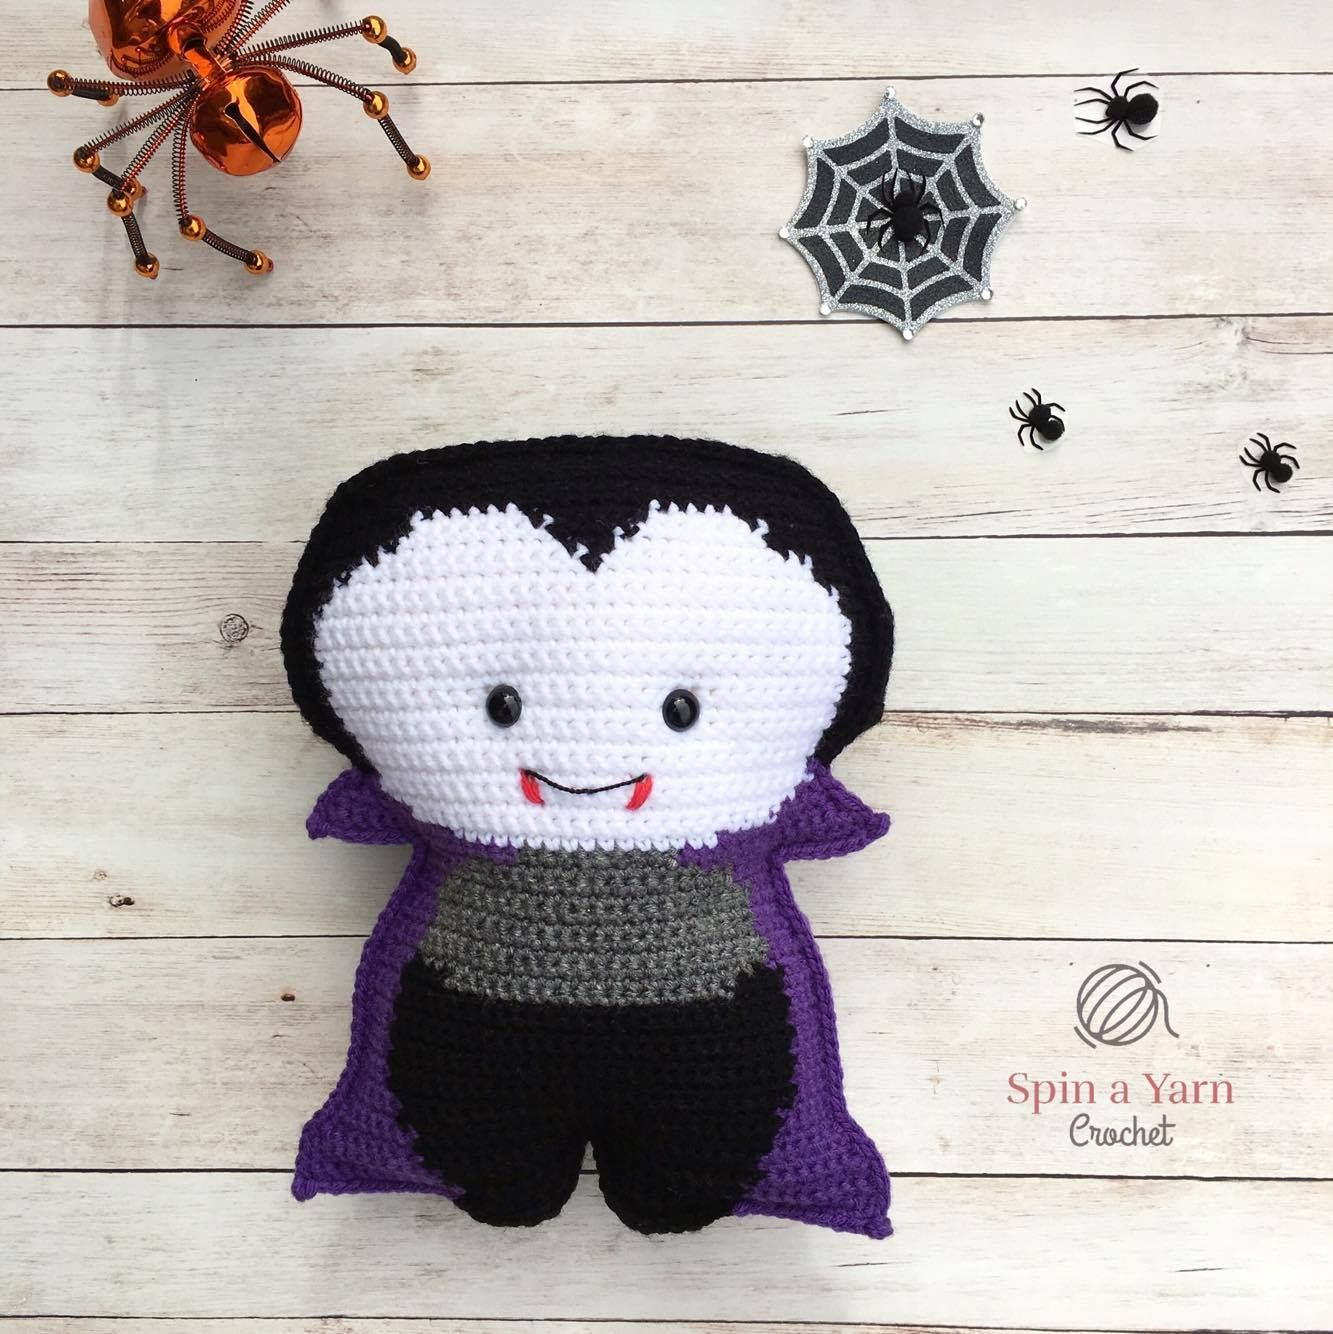 Vampire Amigurumi Free Crochet Pattern • Spin a Yarn Crochet | free ...